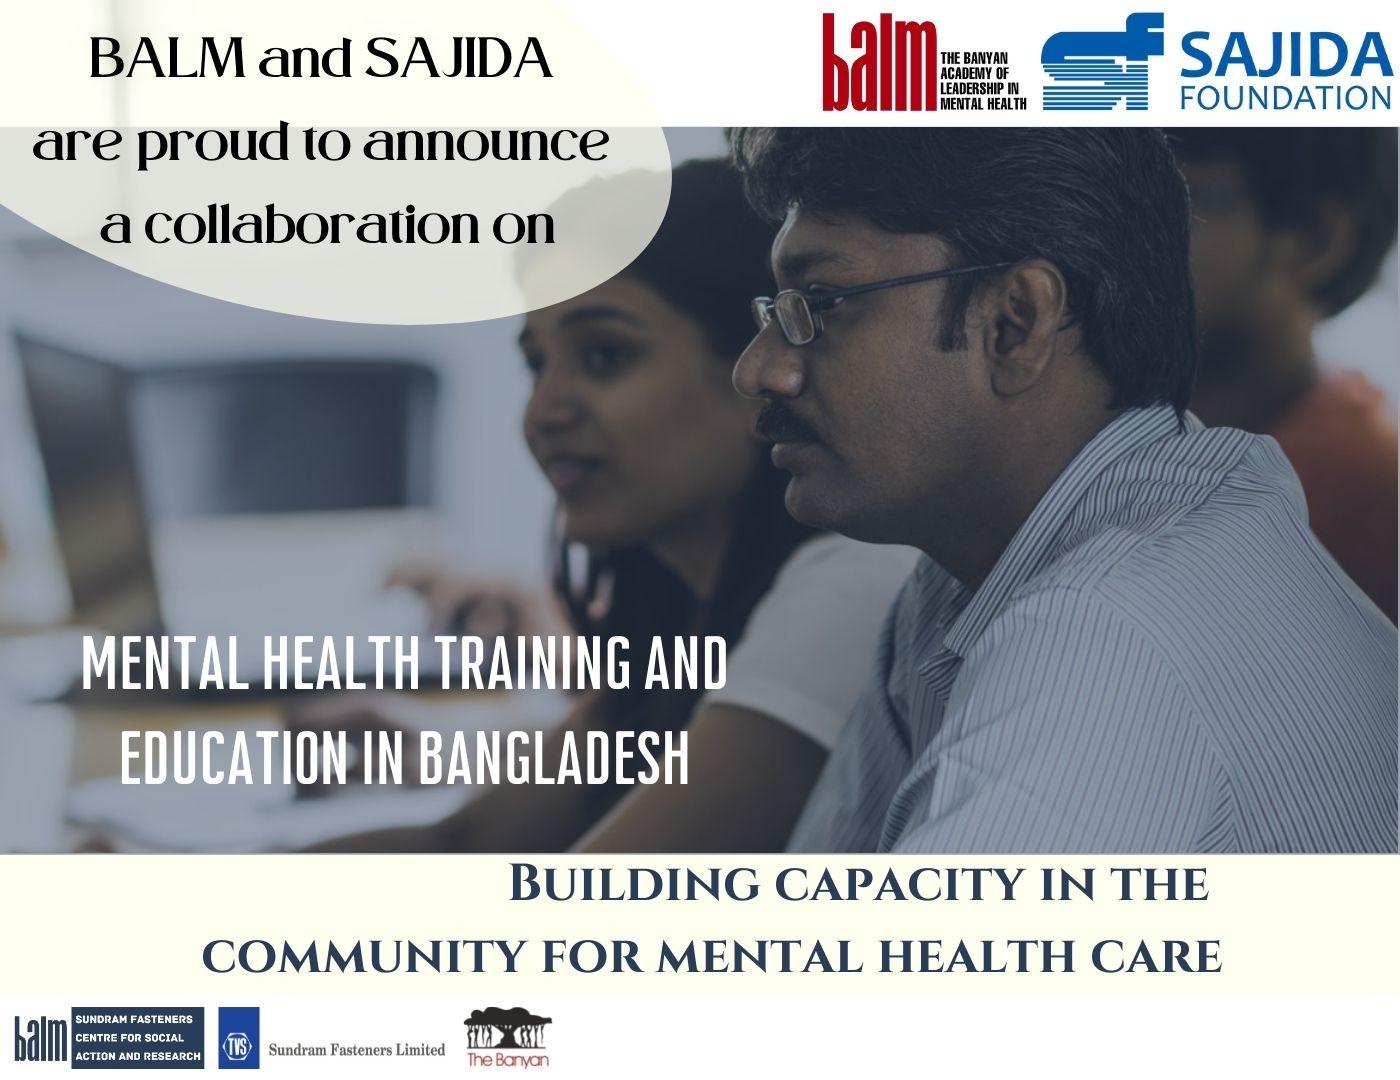 A New Partnership with SAJIDA Foundation